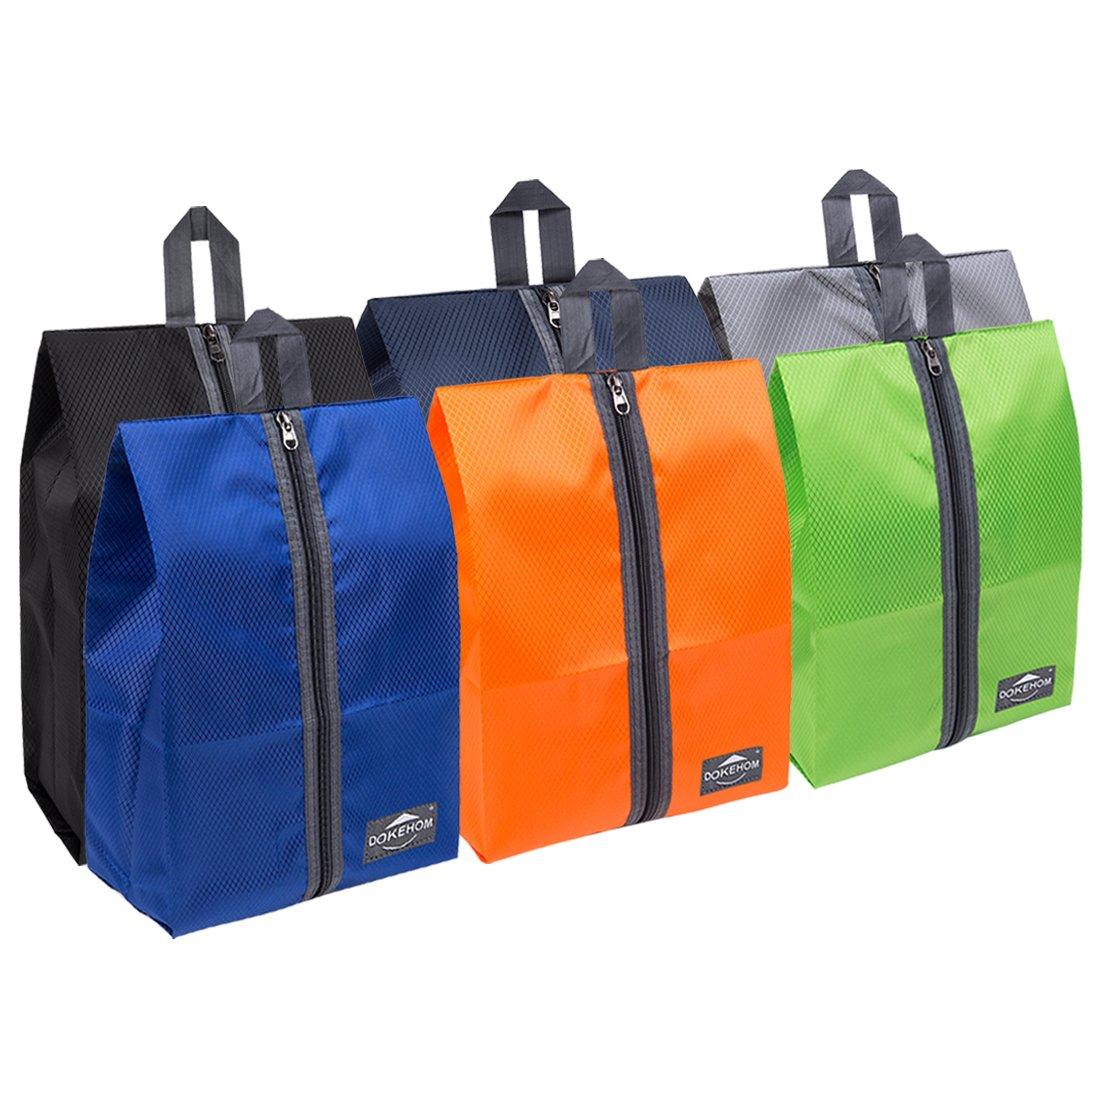 DOKEHOM DKA3030G1 Portable Nylon Travel Shoe Storage Organizer Bag (8 Colors) with Zipper Closure (Pack 6, Multicolor)